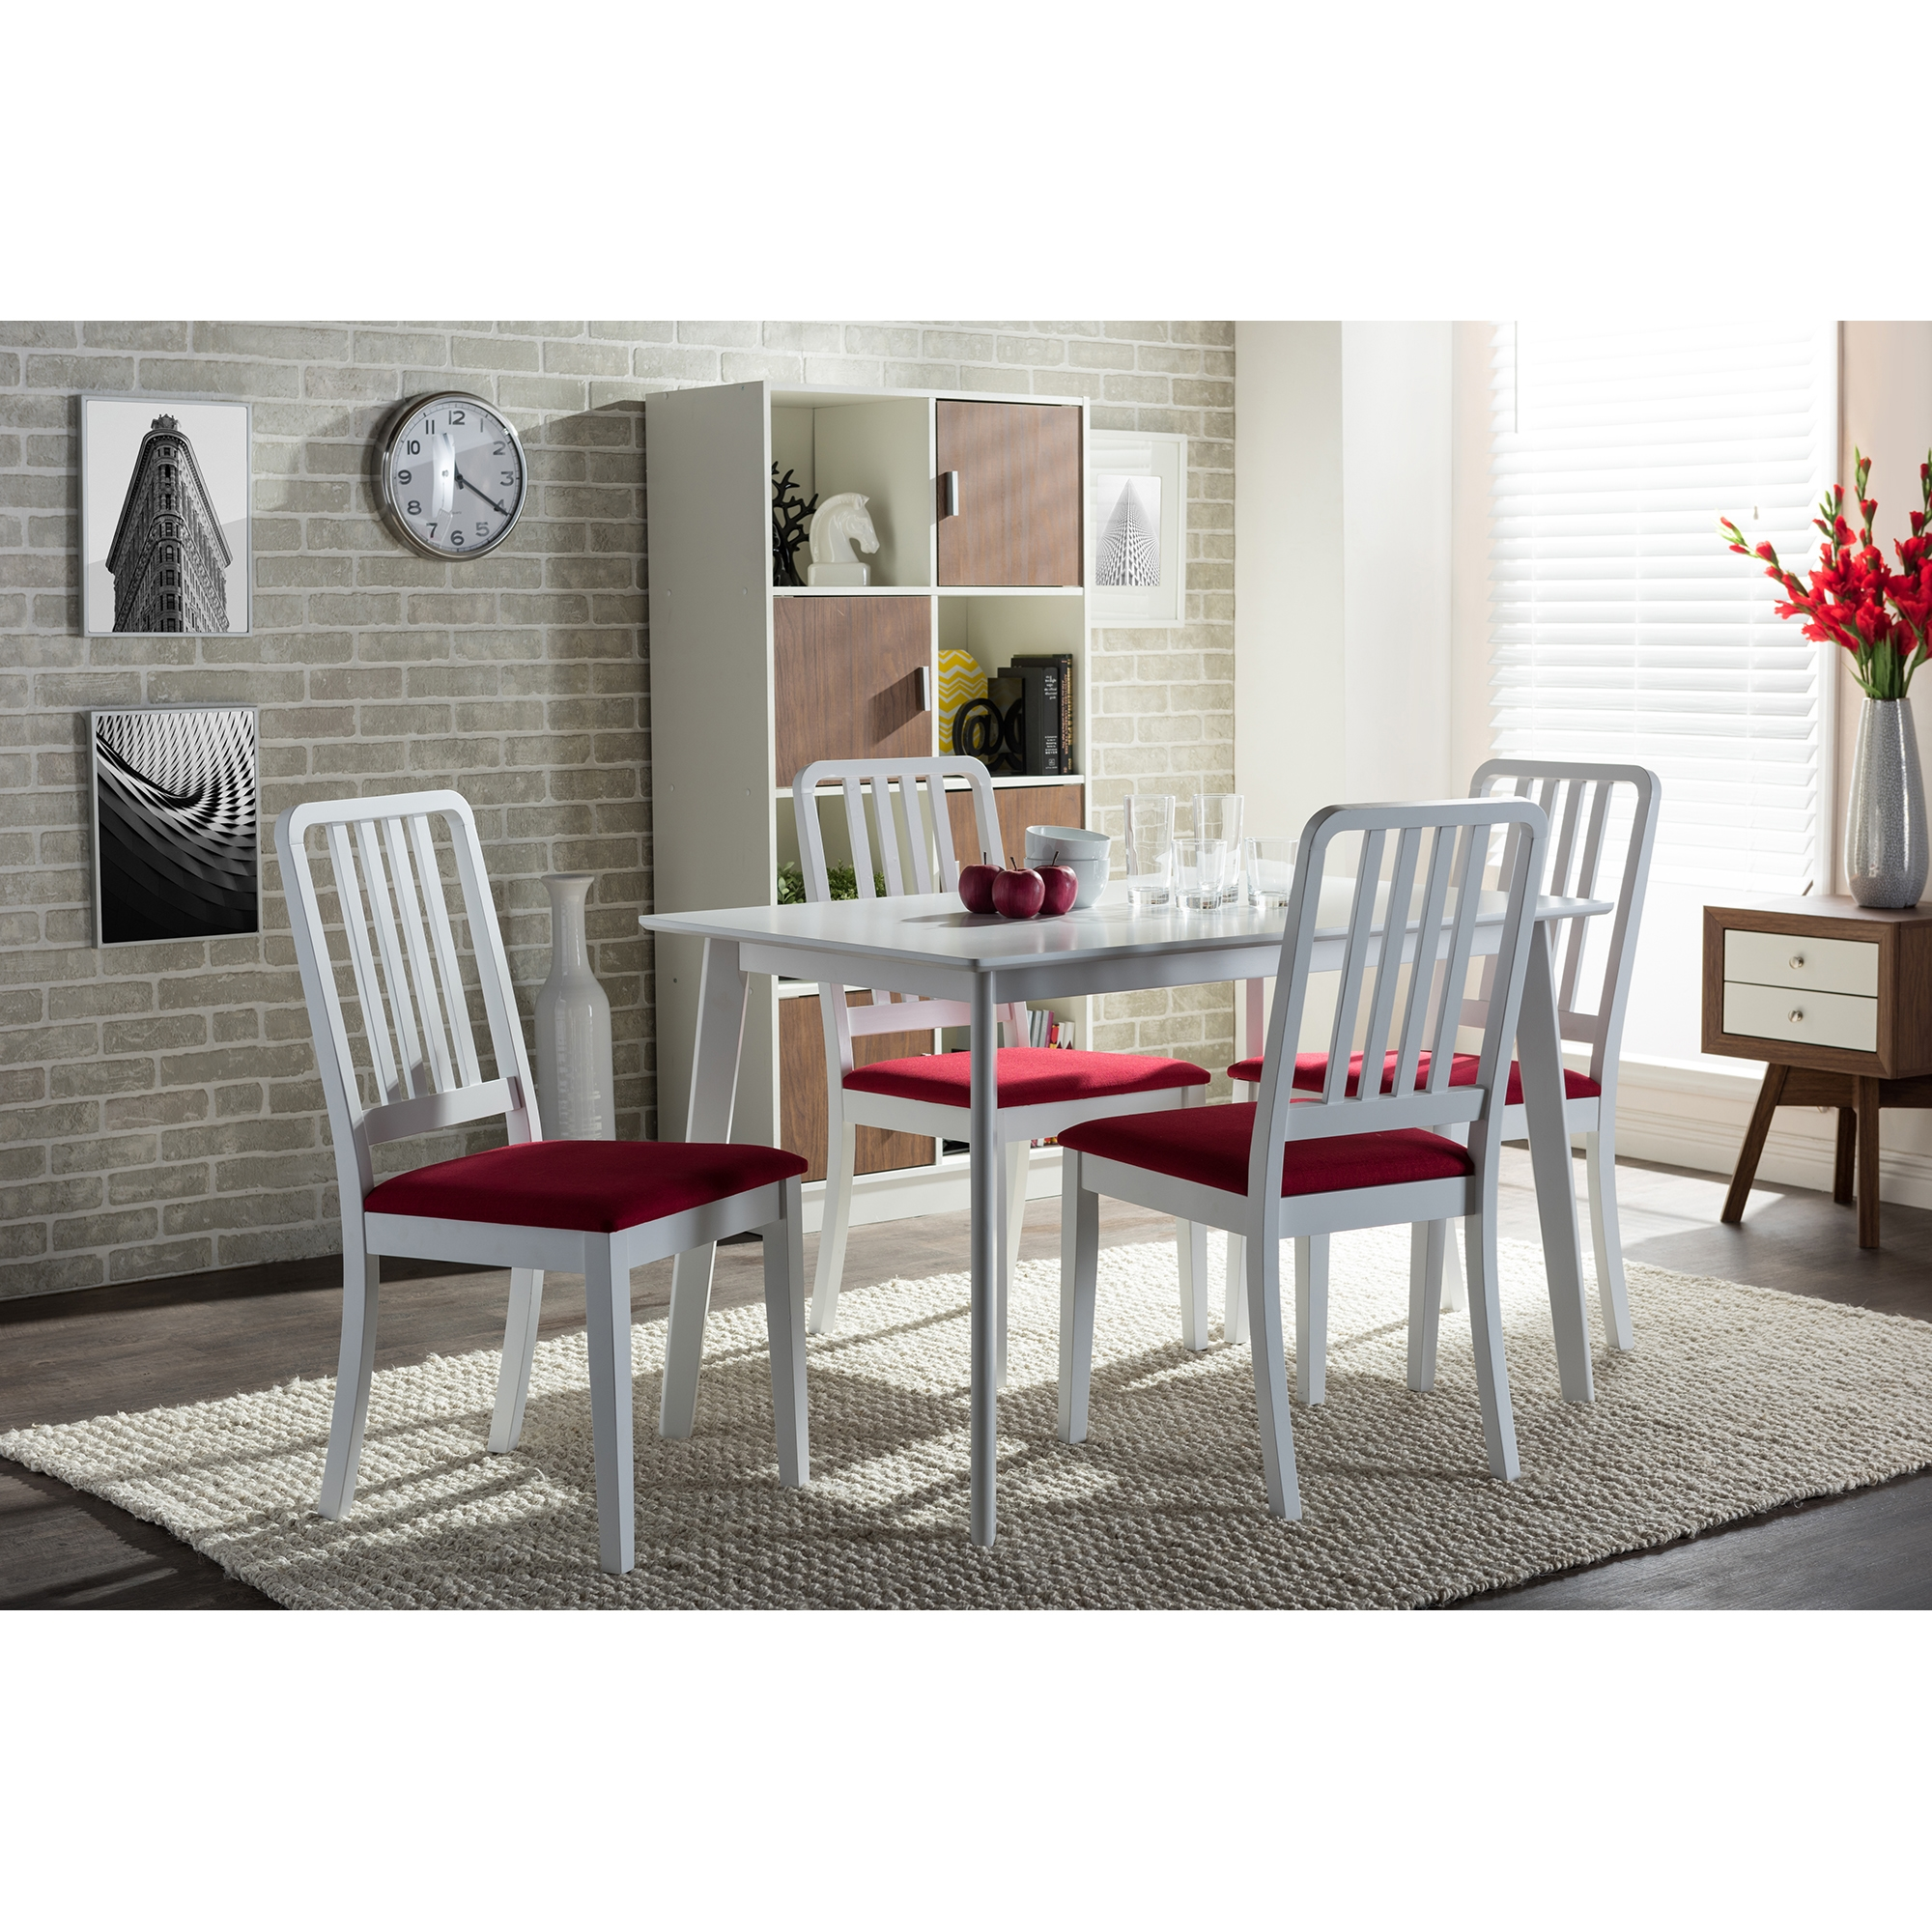 ... Baxton Studio Jasmine Mid Century Modern 5 Piece White Wood Dining Set  With Red